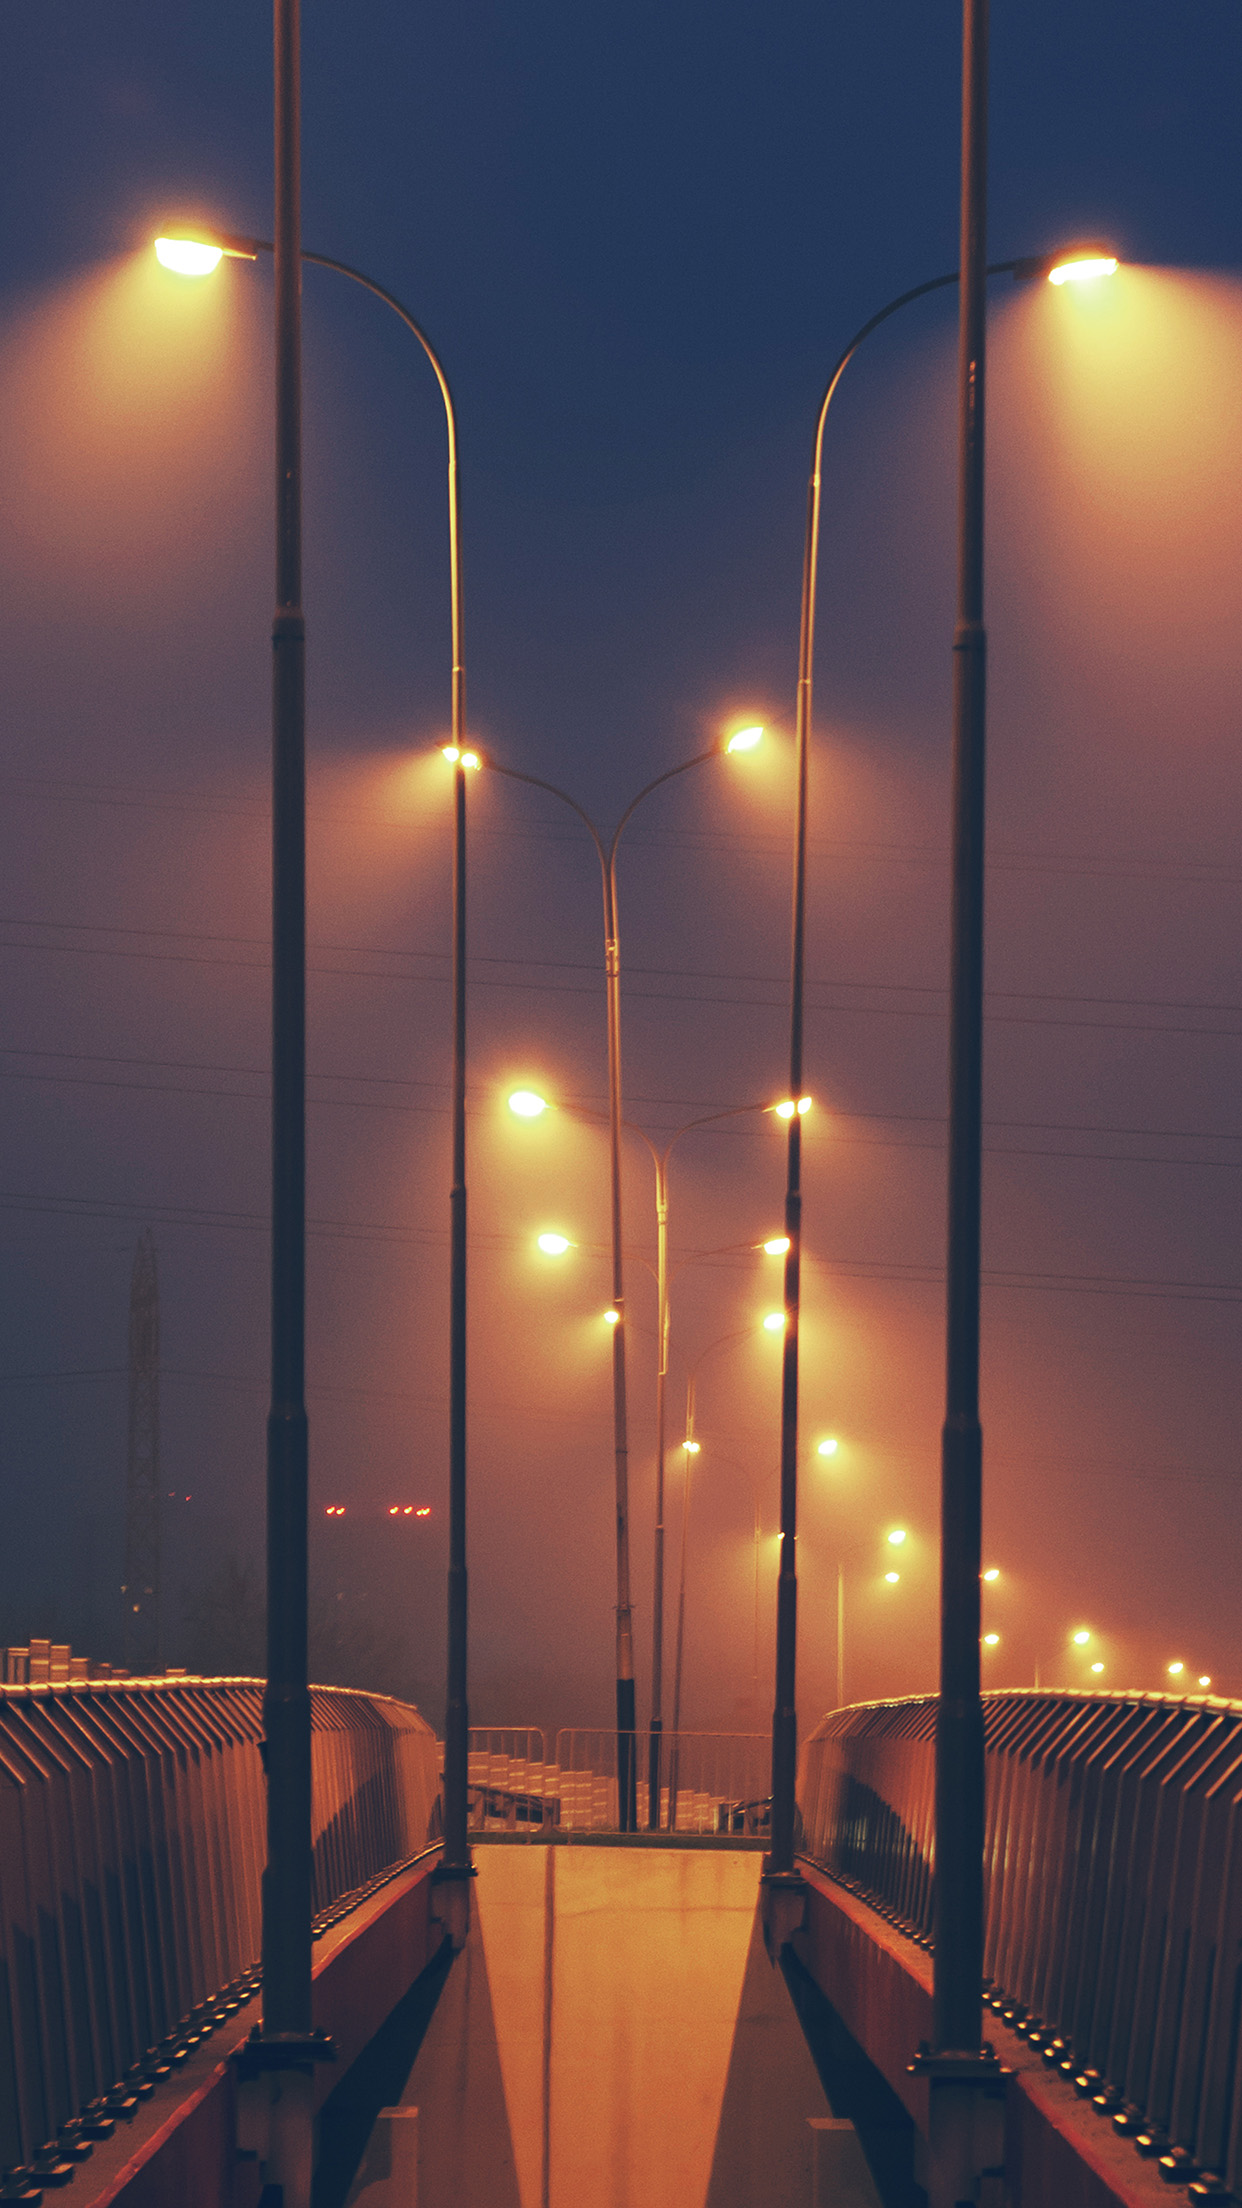 Video Game Girl Wallpaper Mv05 Night Bridge City View Lights Street Orange Dark